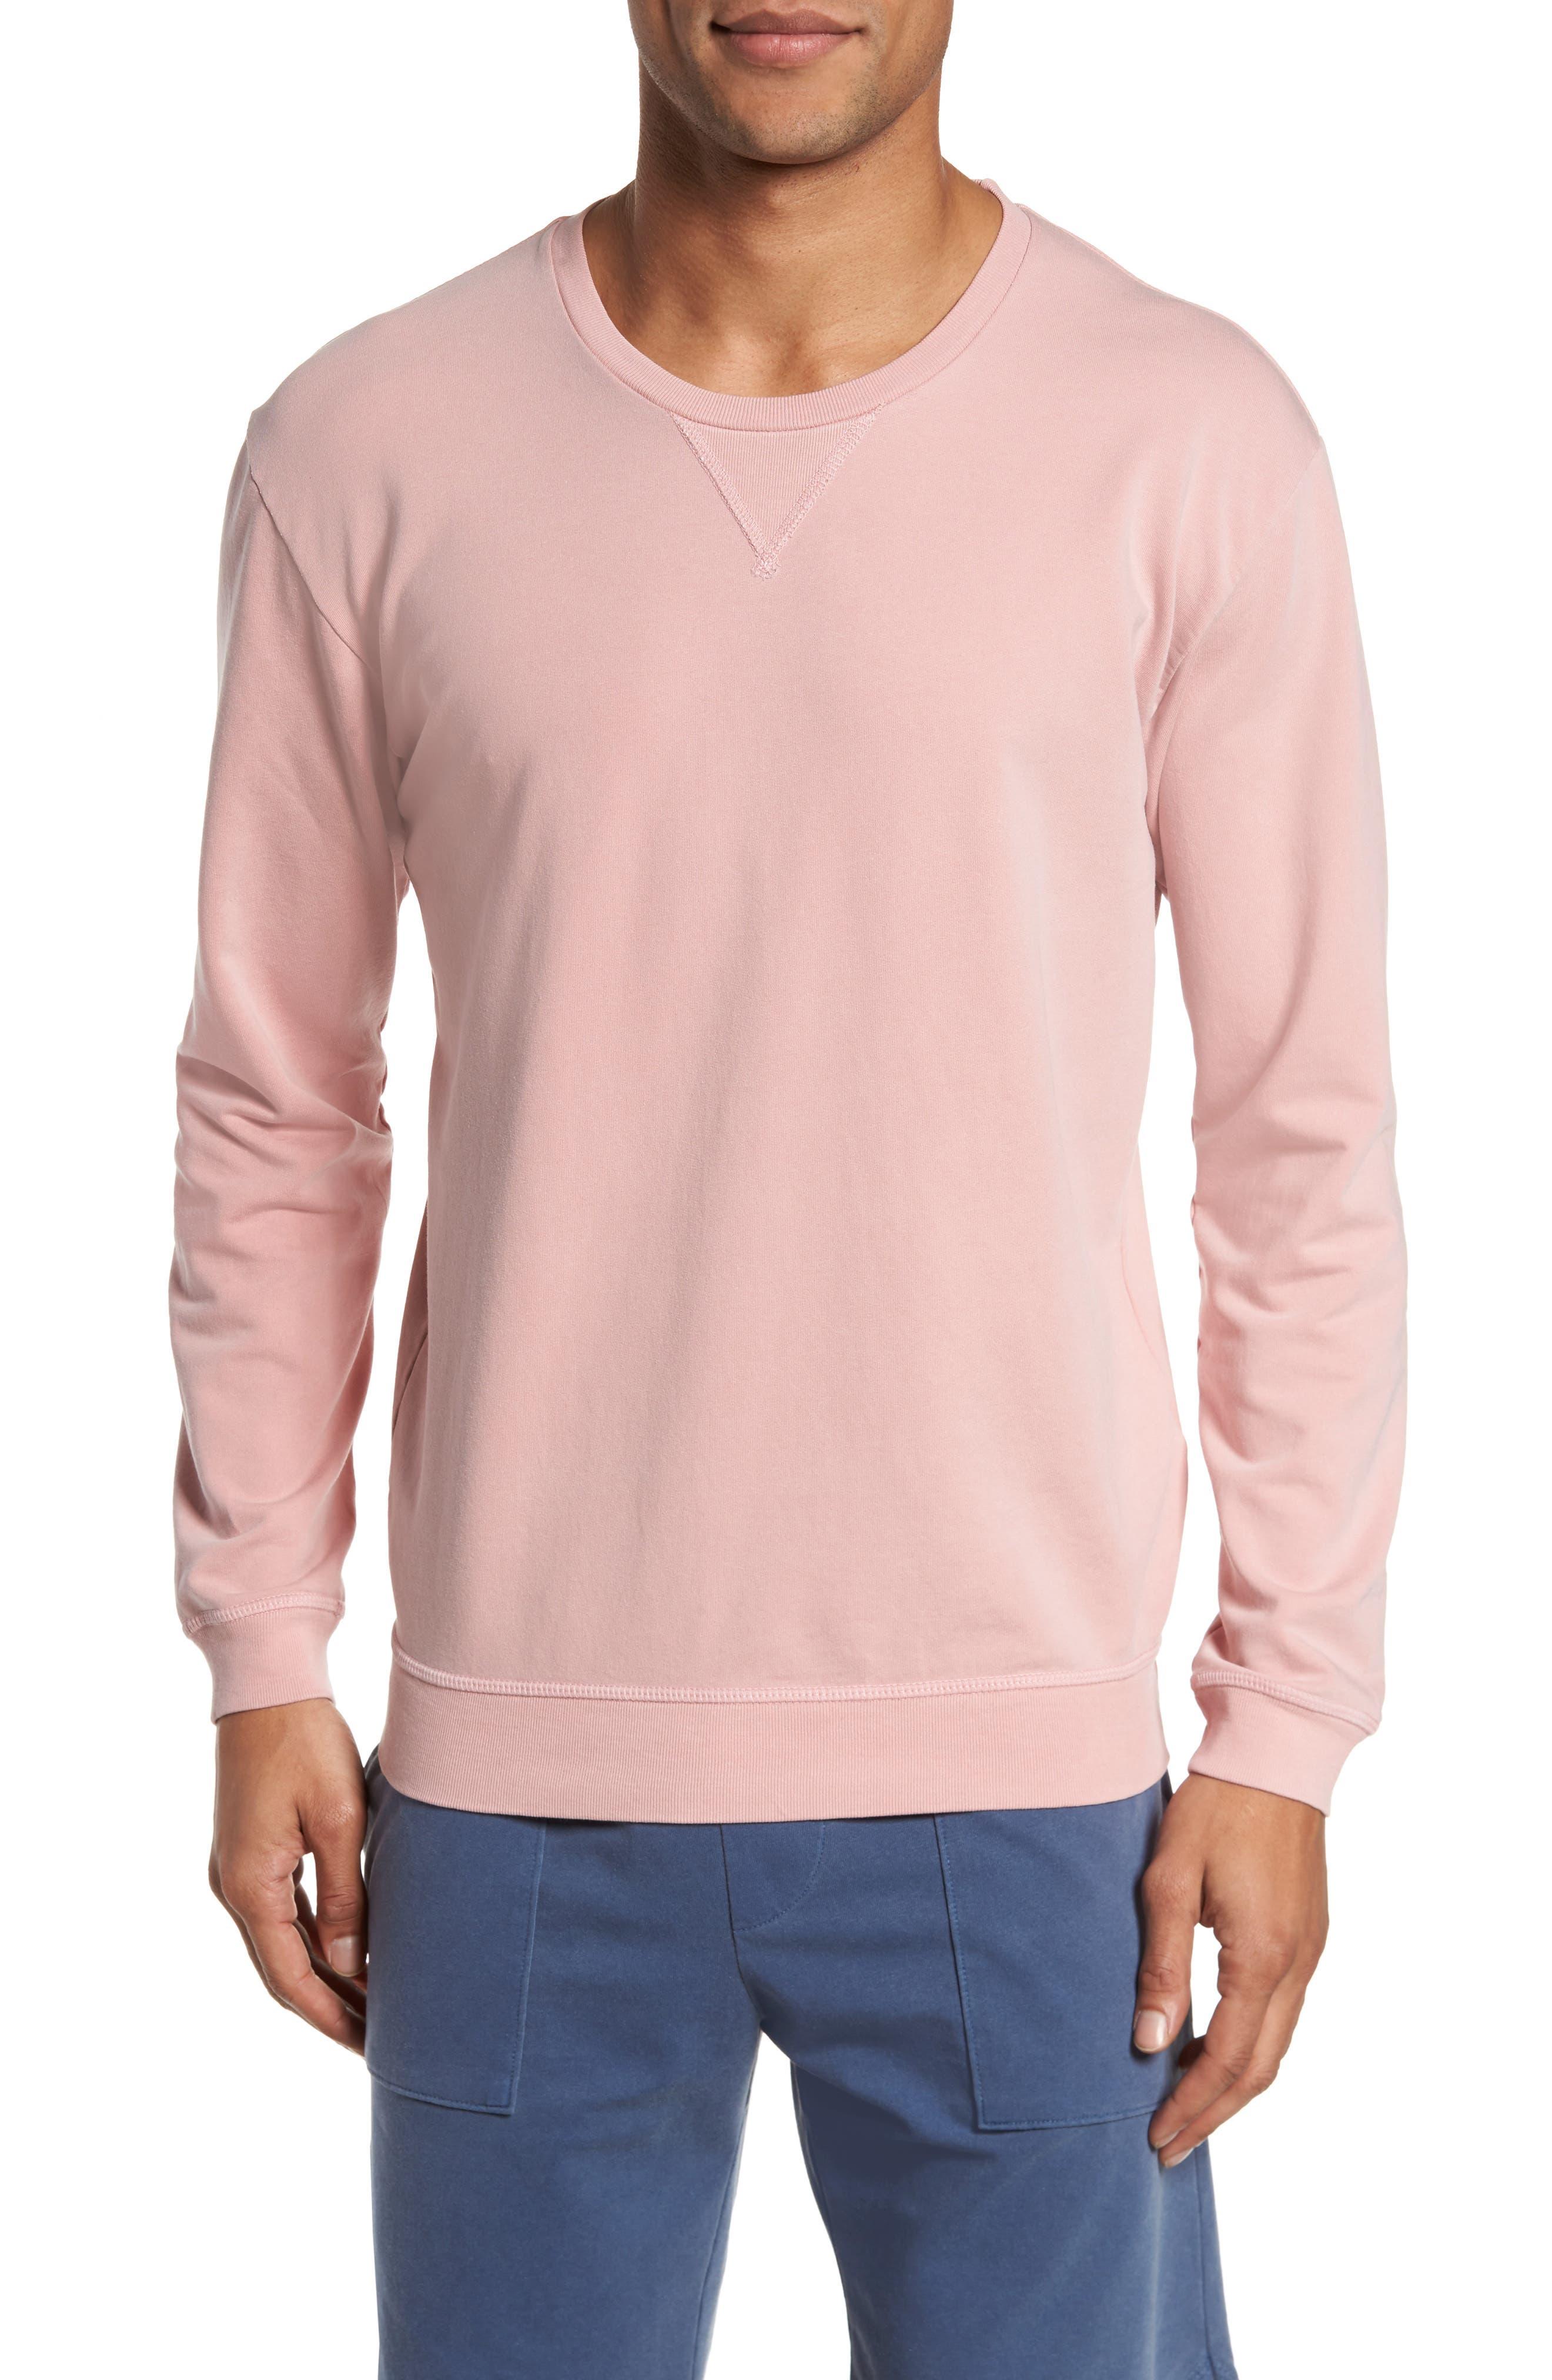 Main Image - Goodlife Slim Fit Crewneck Sweatshirt